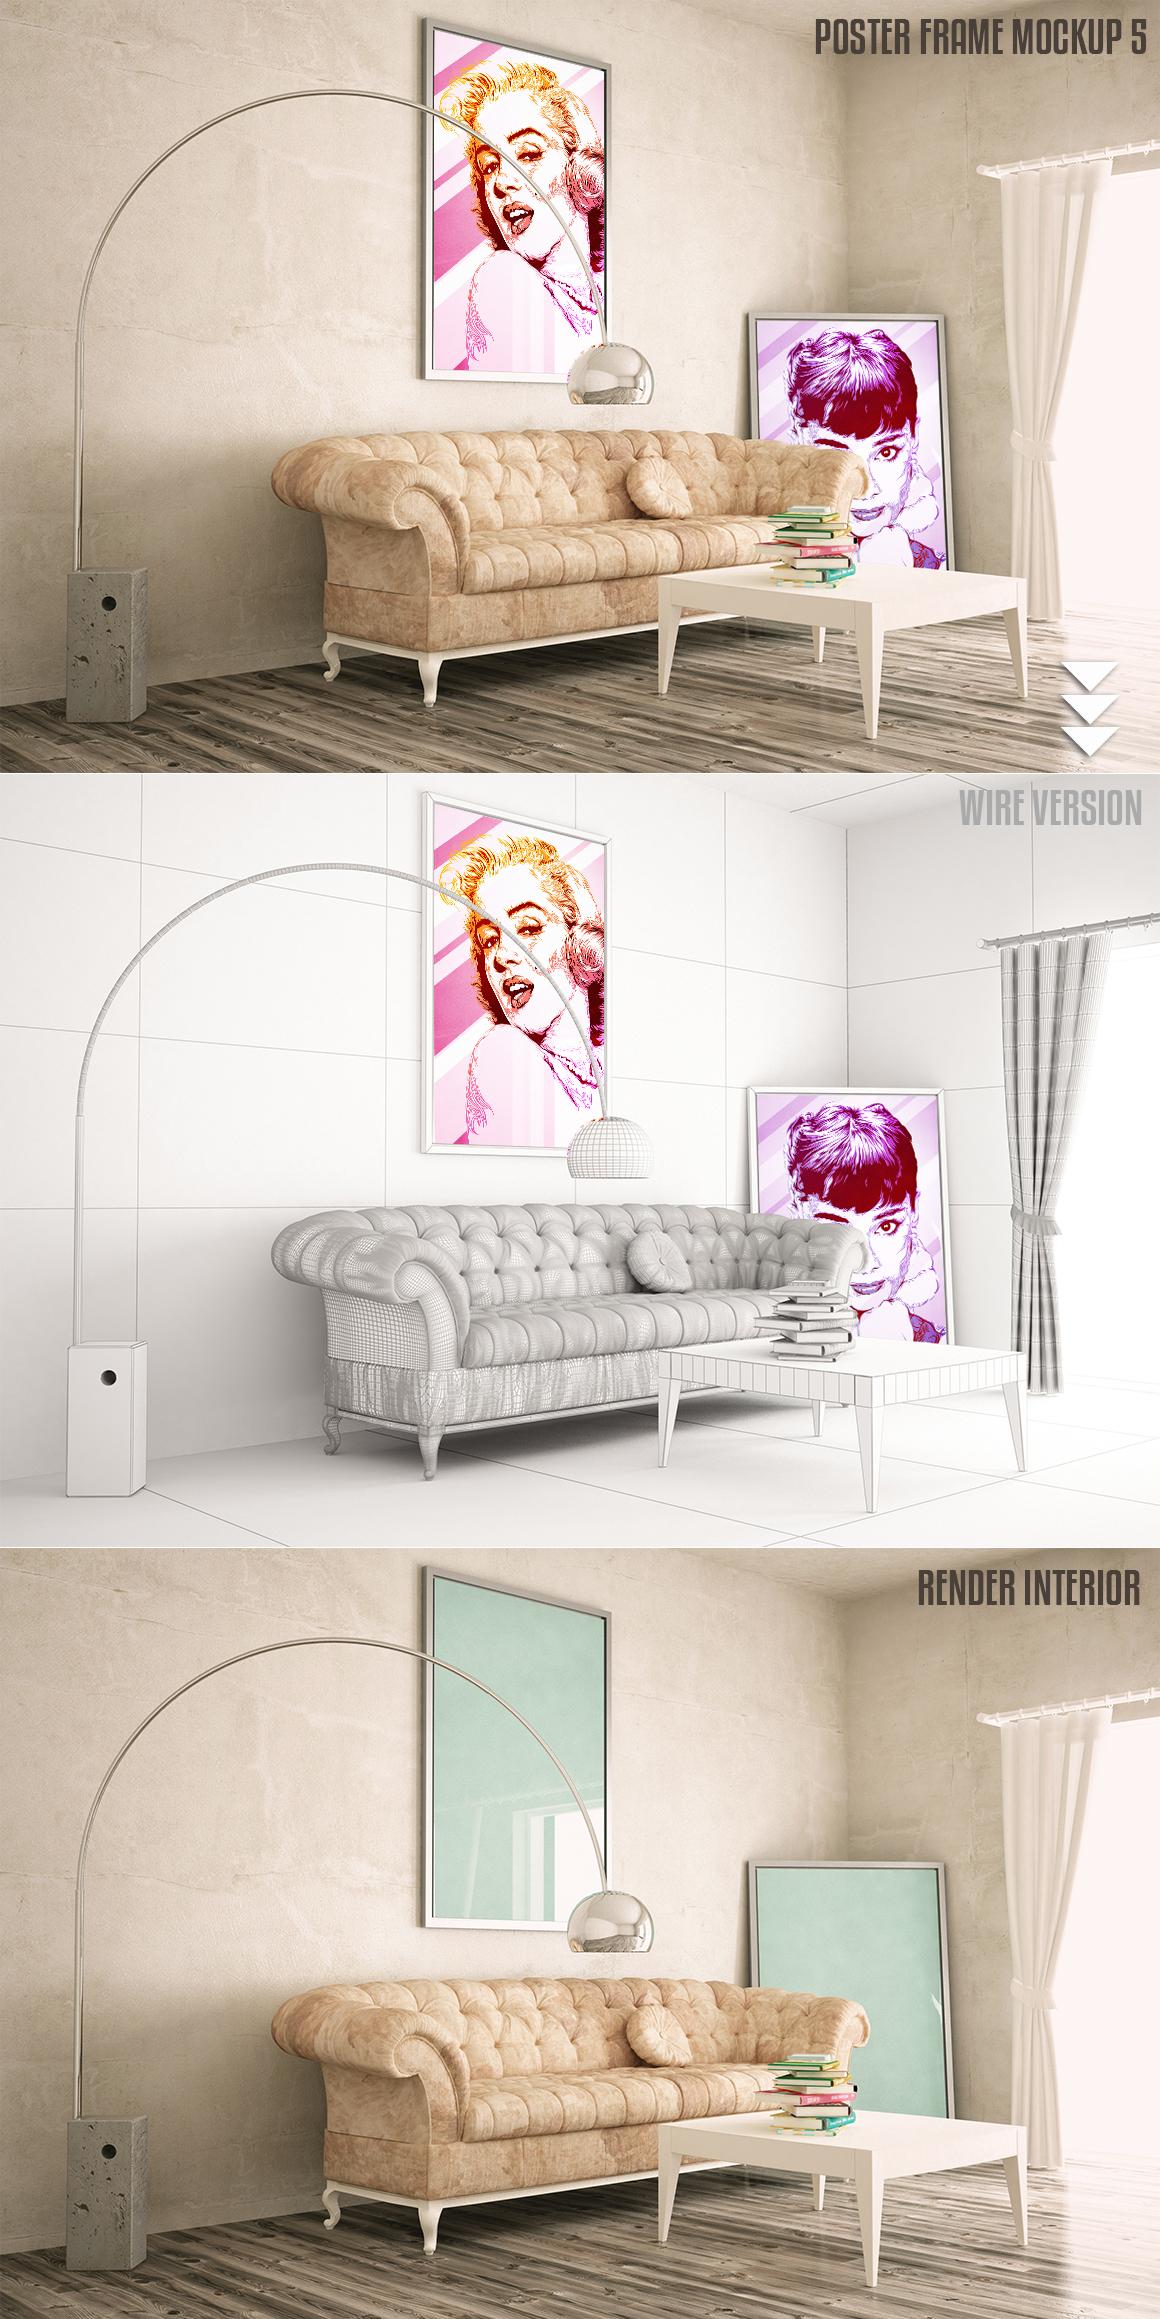 Interiors mock-up Vol. 2 example image 5